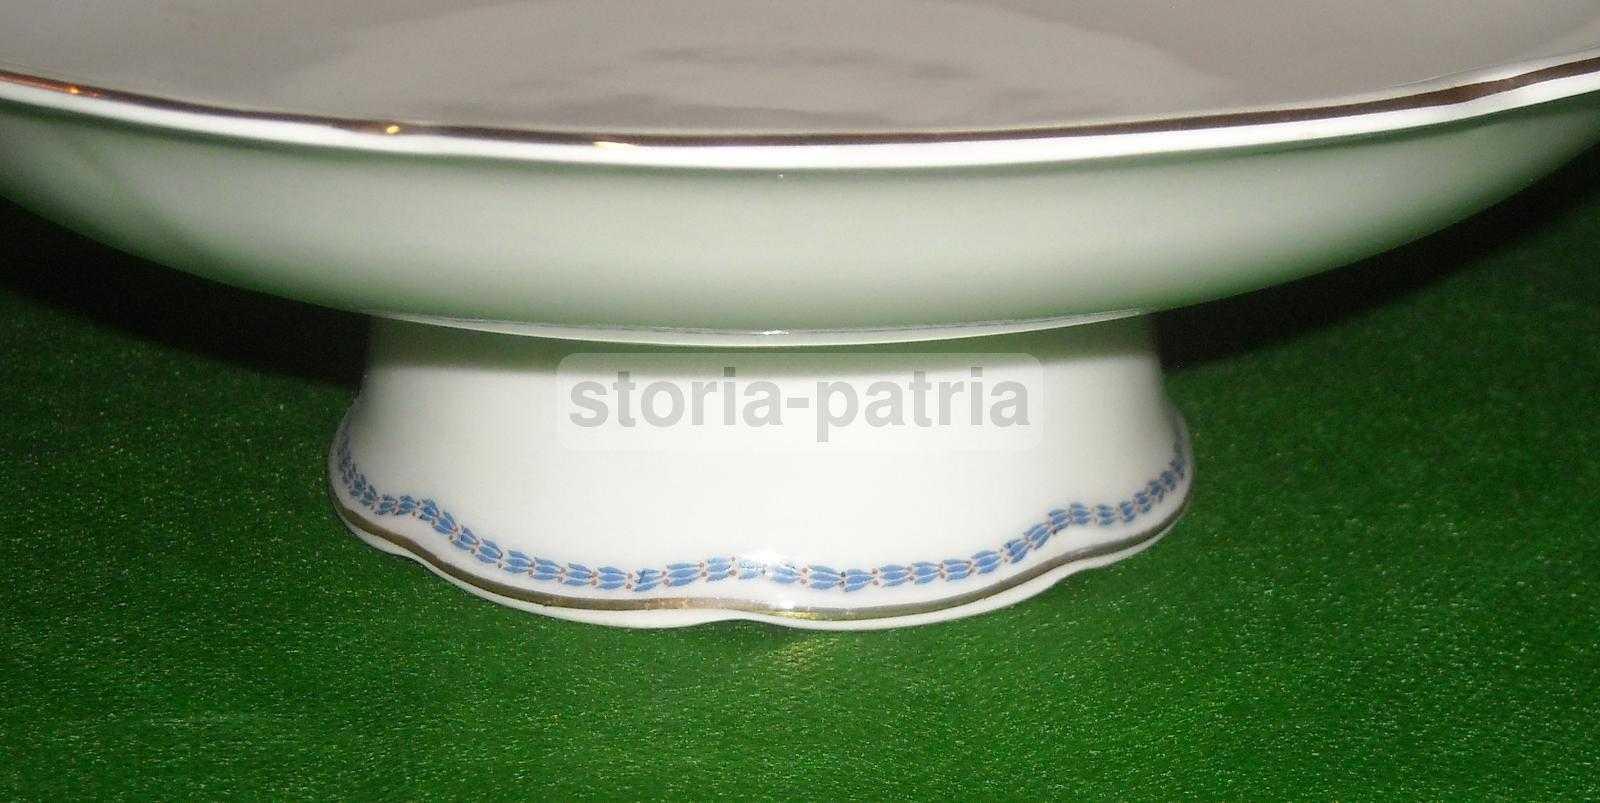 Antica Alzatina, Elegante Porcellana, Richard Ginori ...